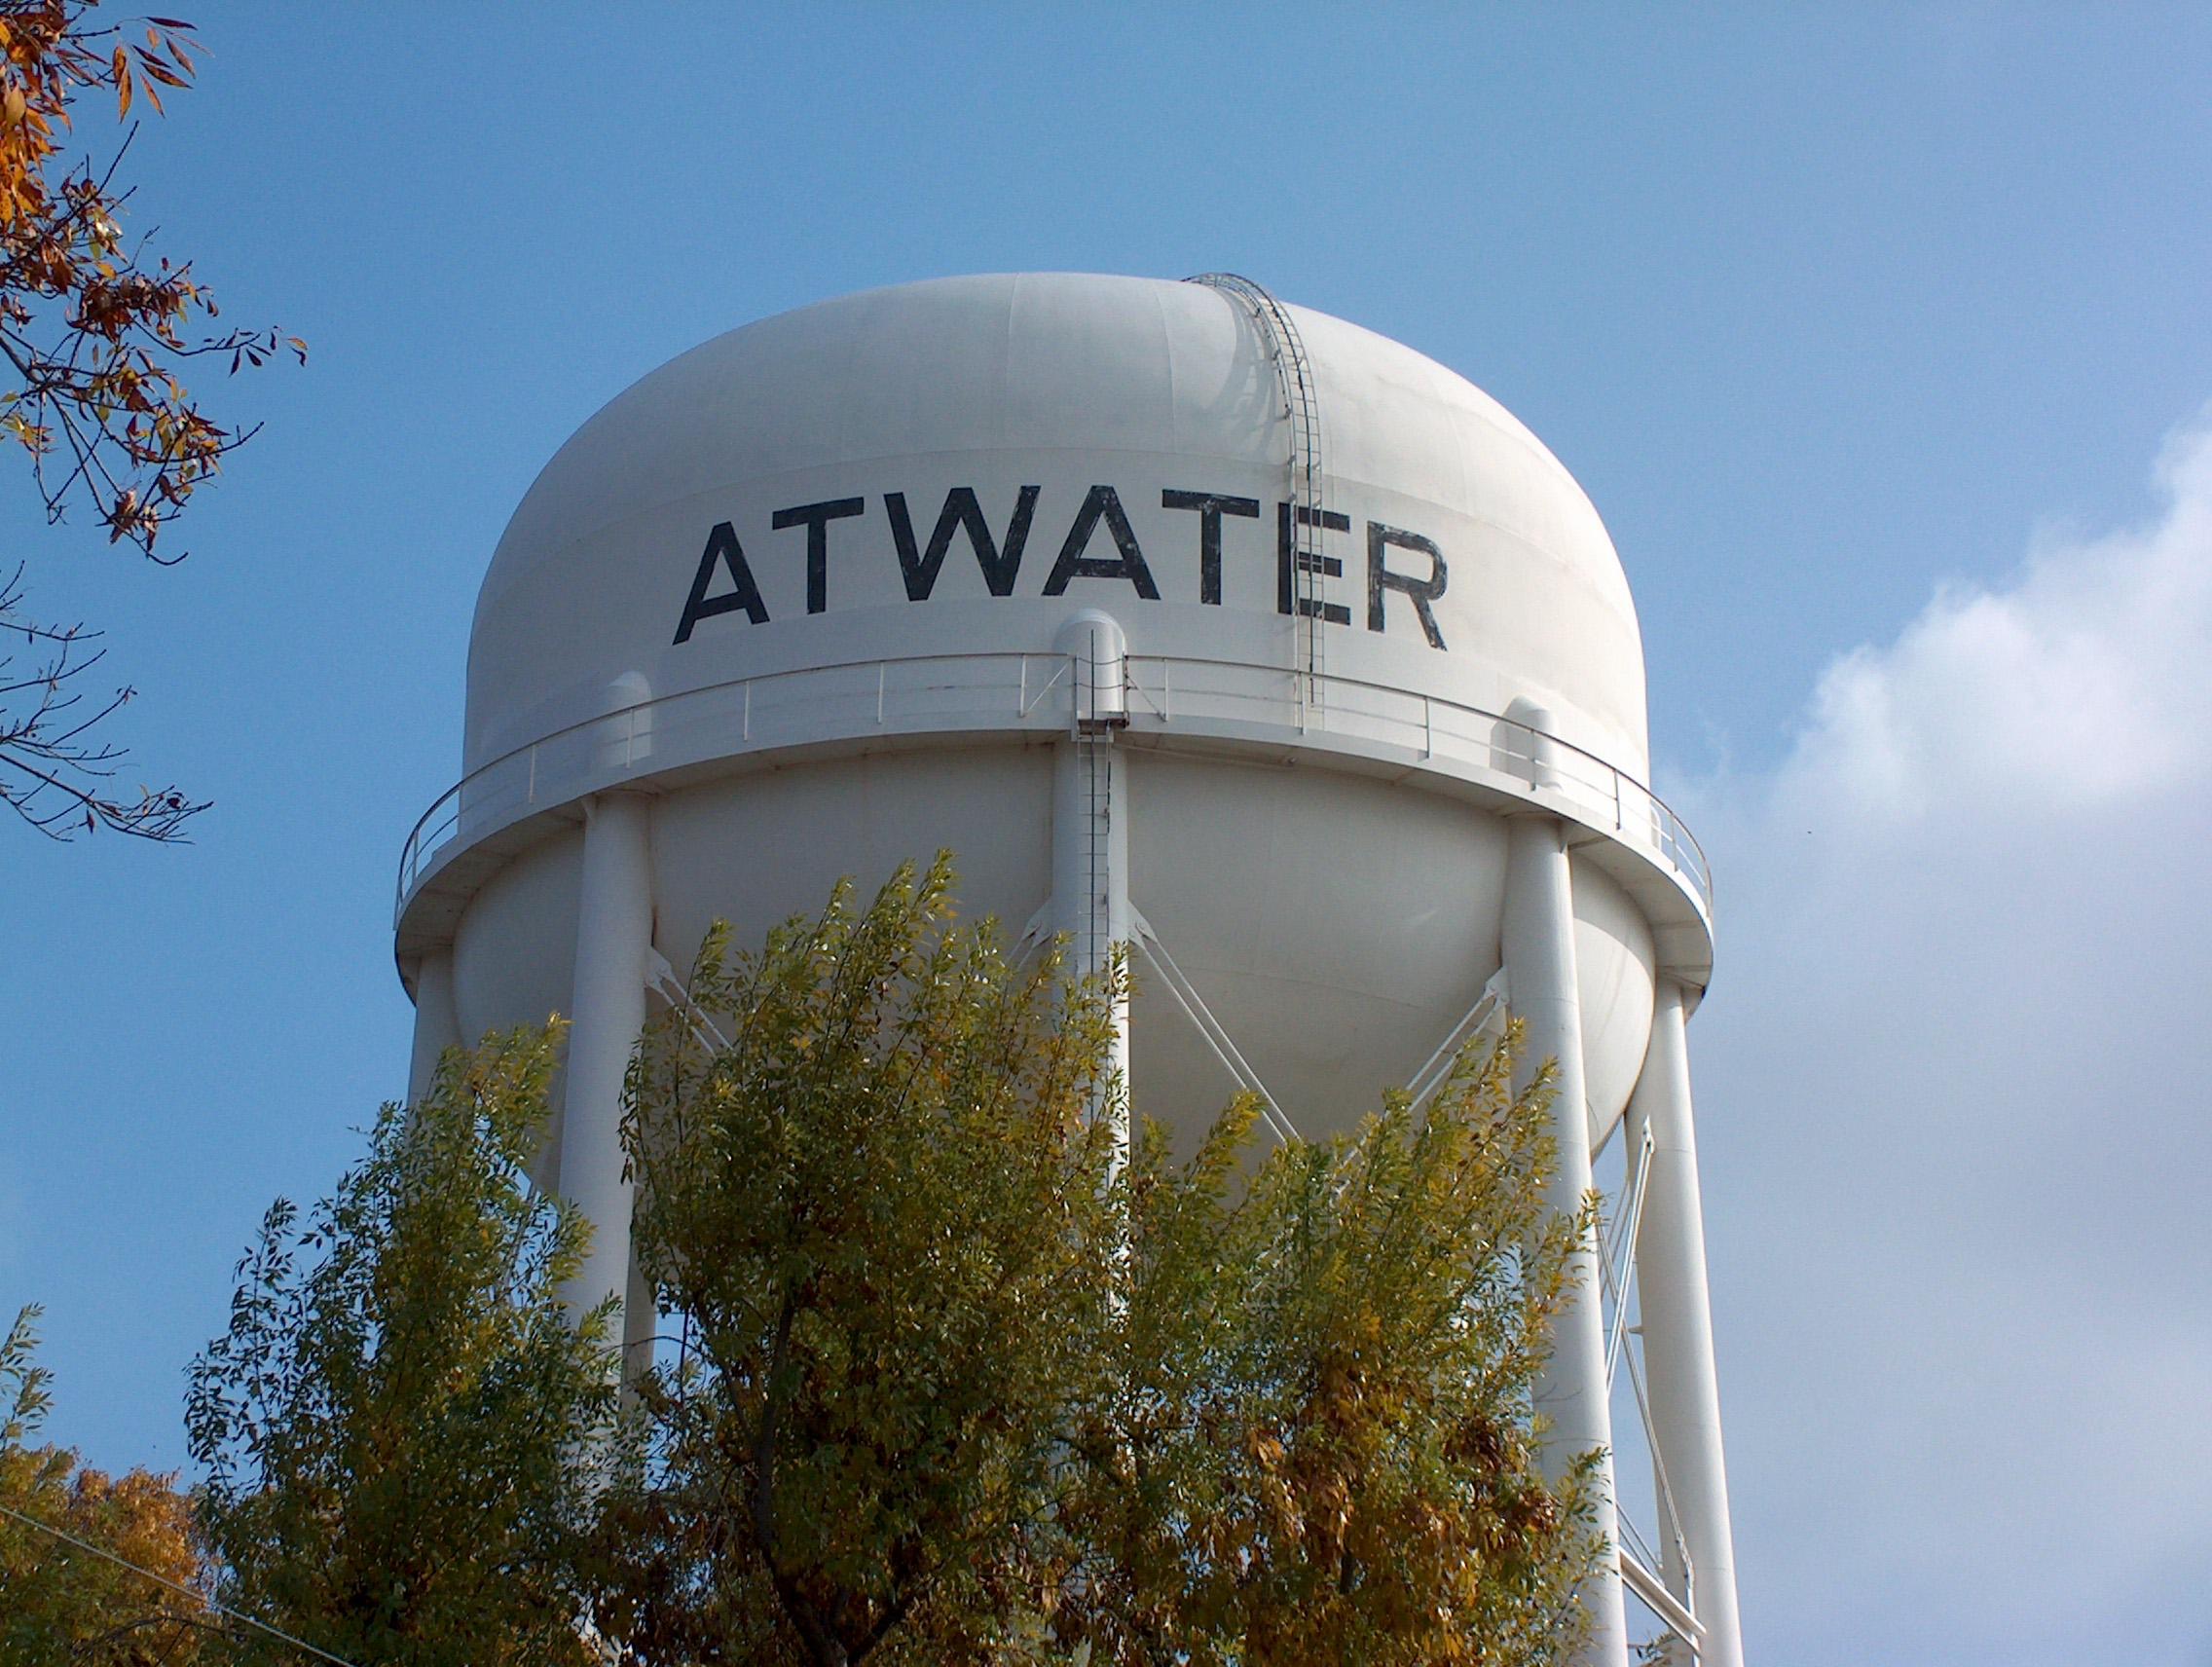 File:Atwater tower.jpg